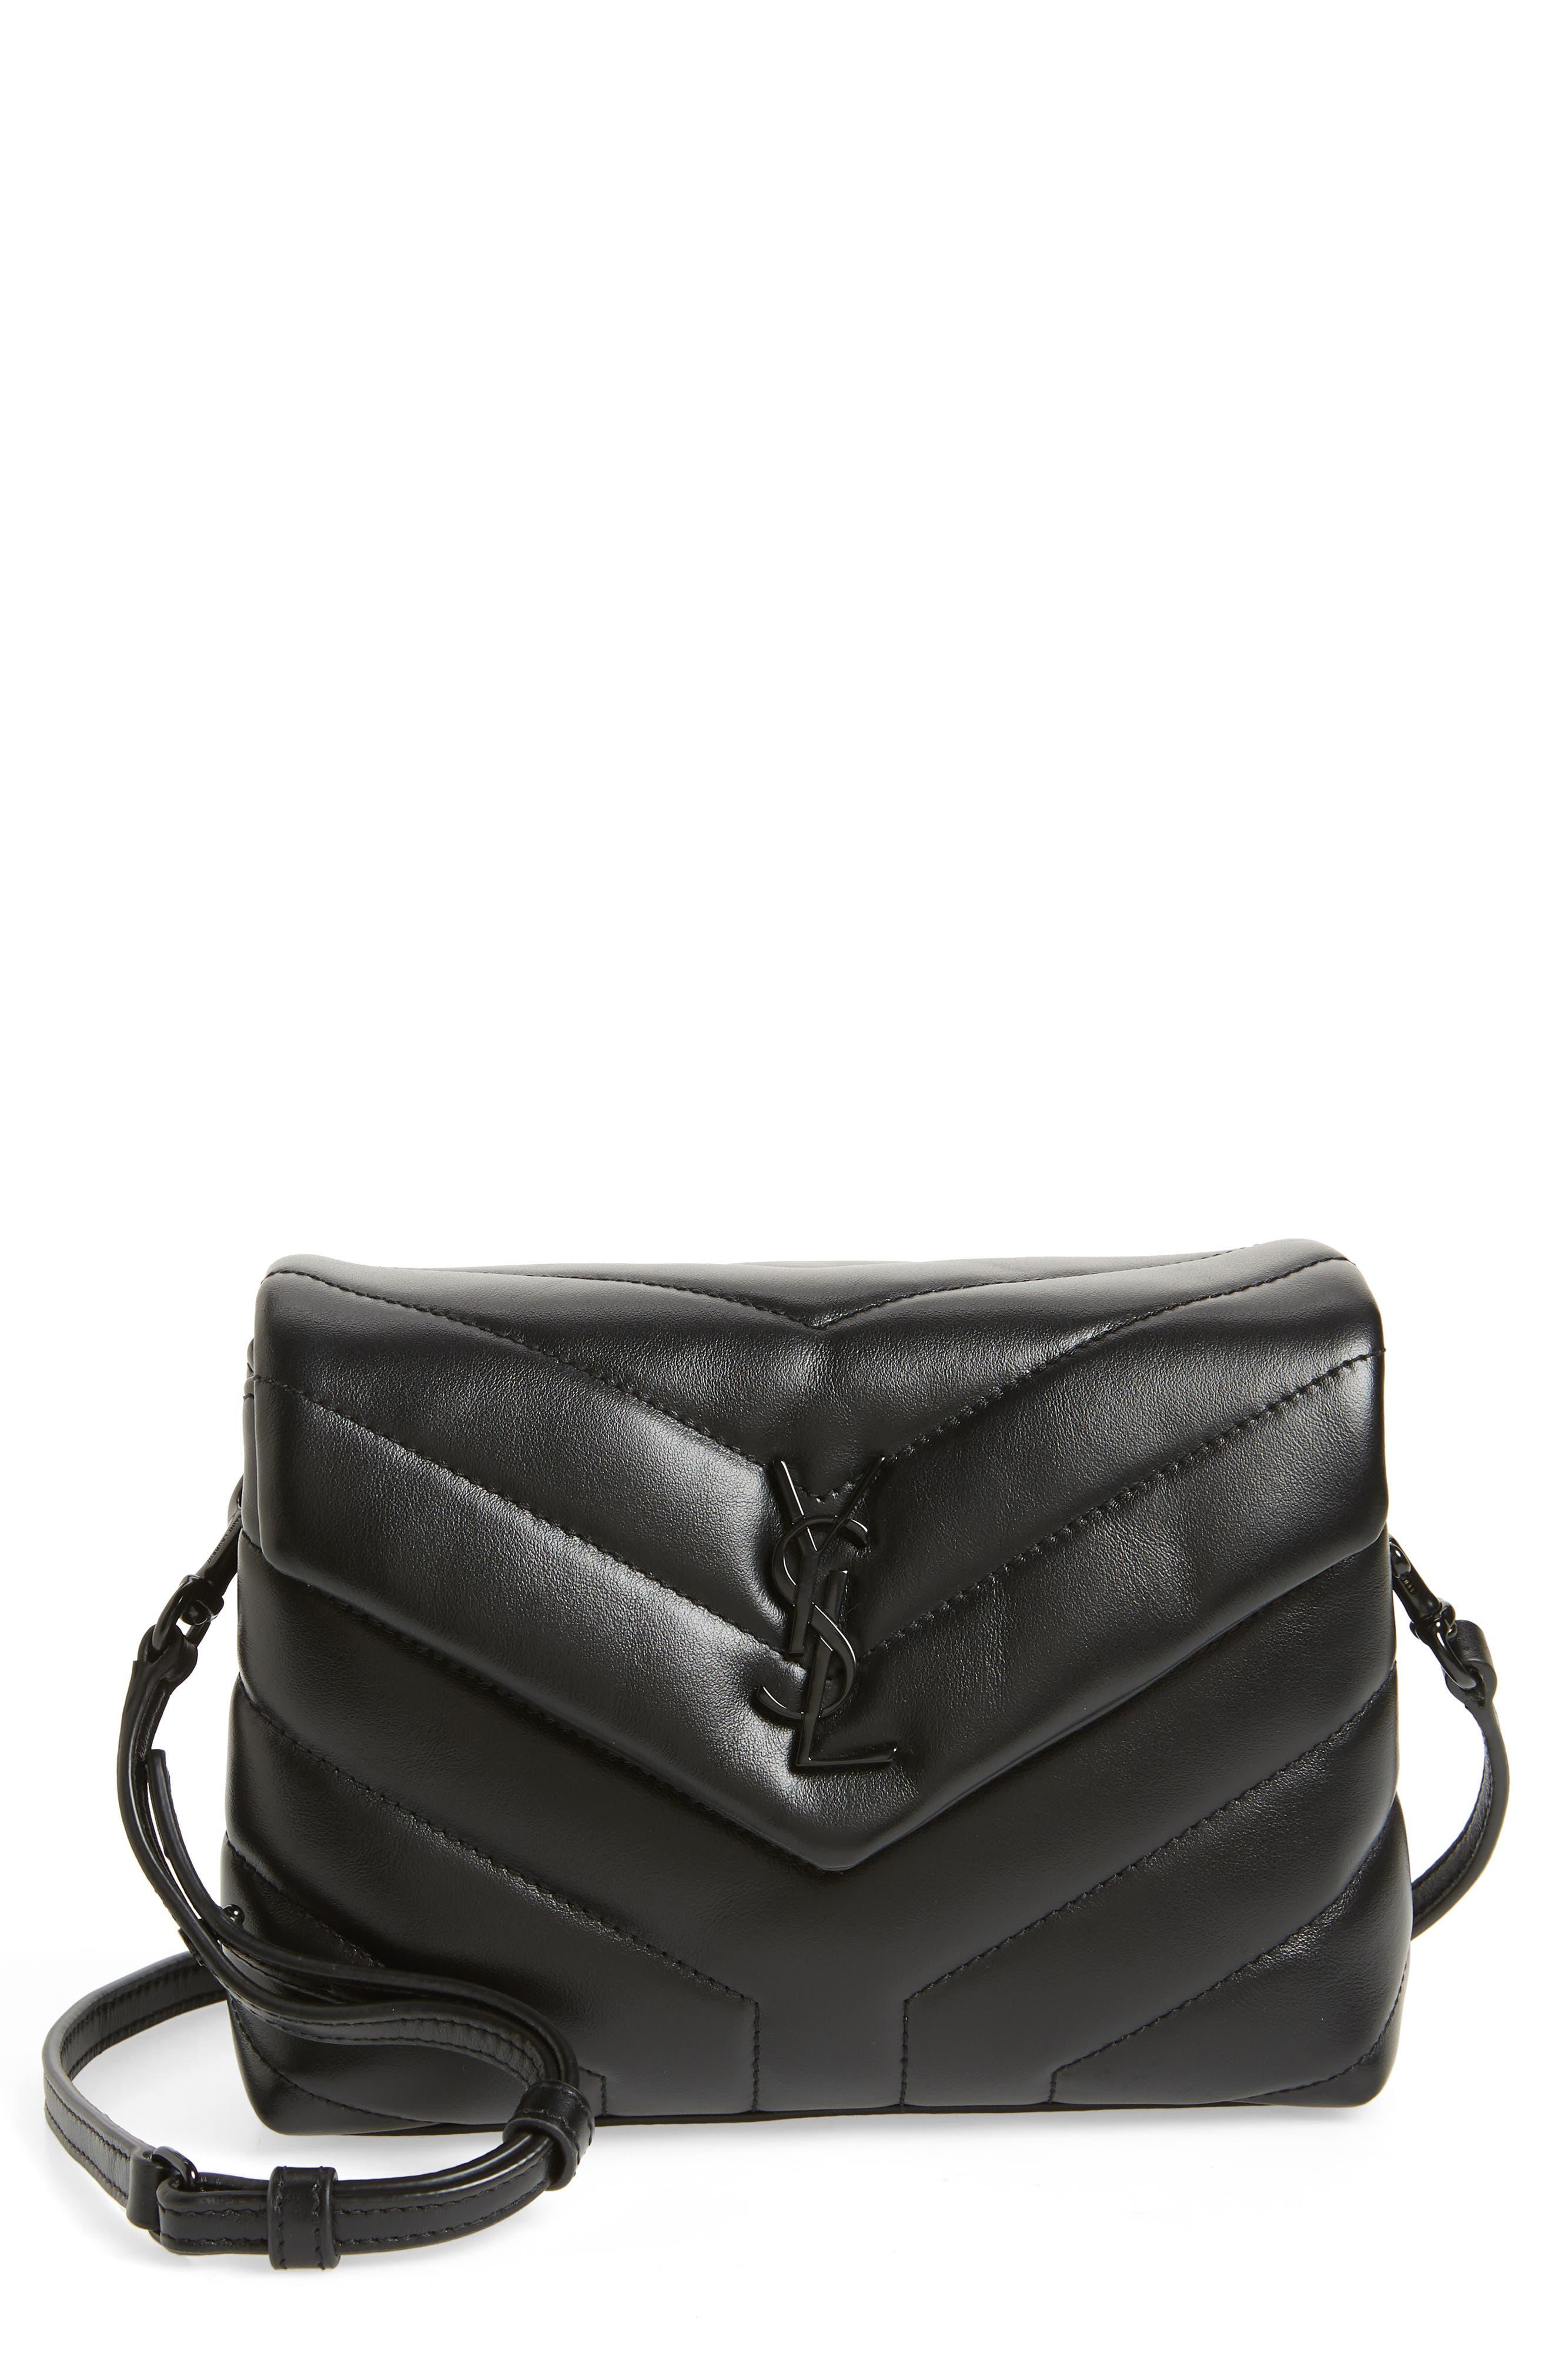 SAINT LAURENT Toy Loulou Leather Crossbody Bag, Main, color, 001